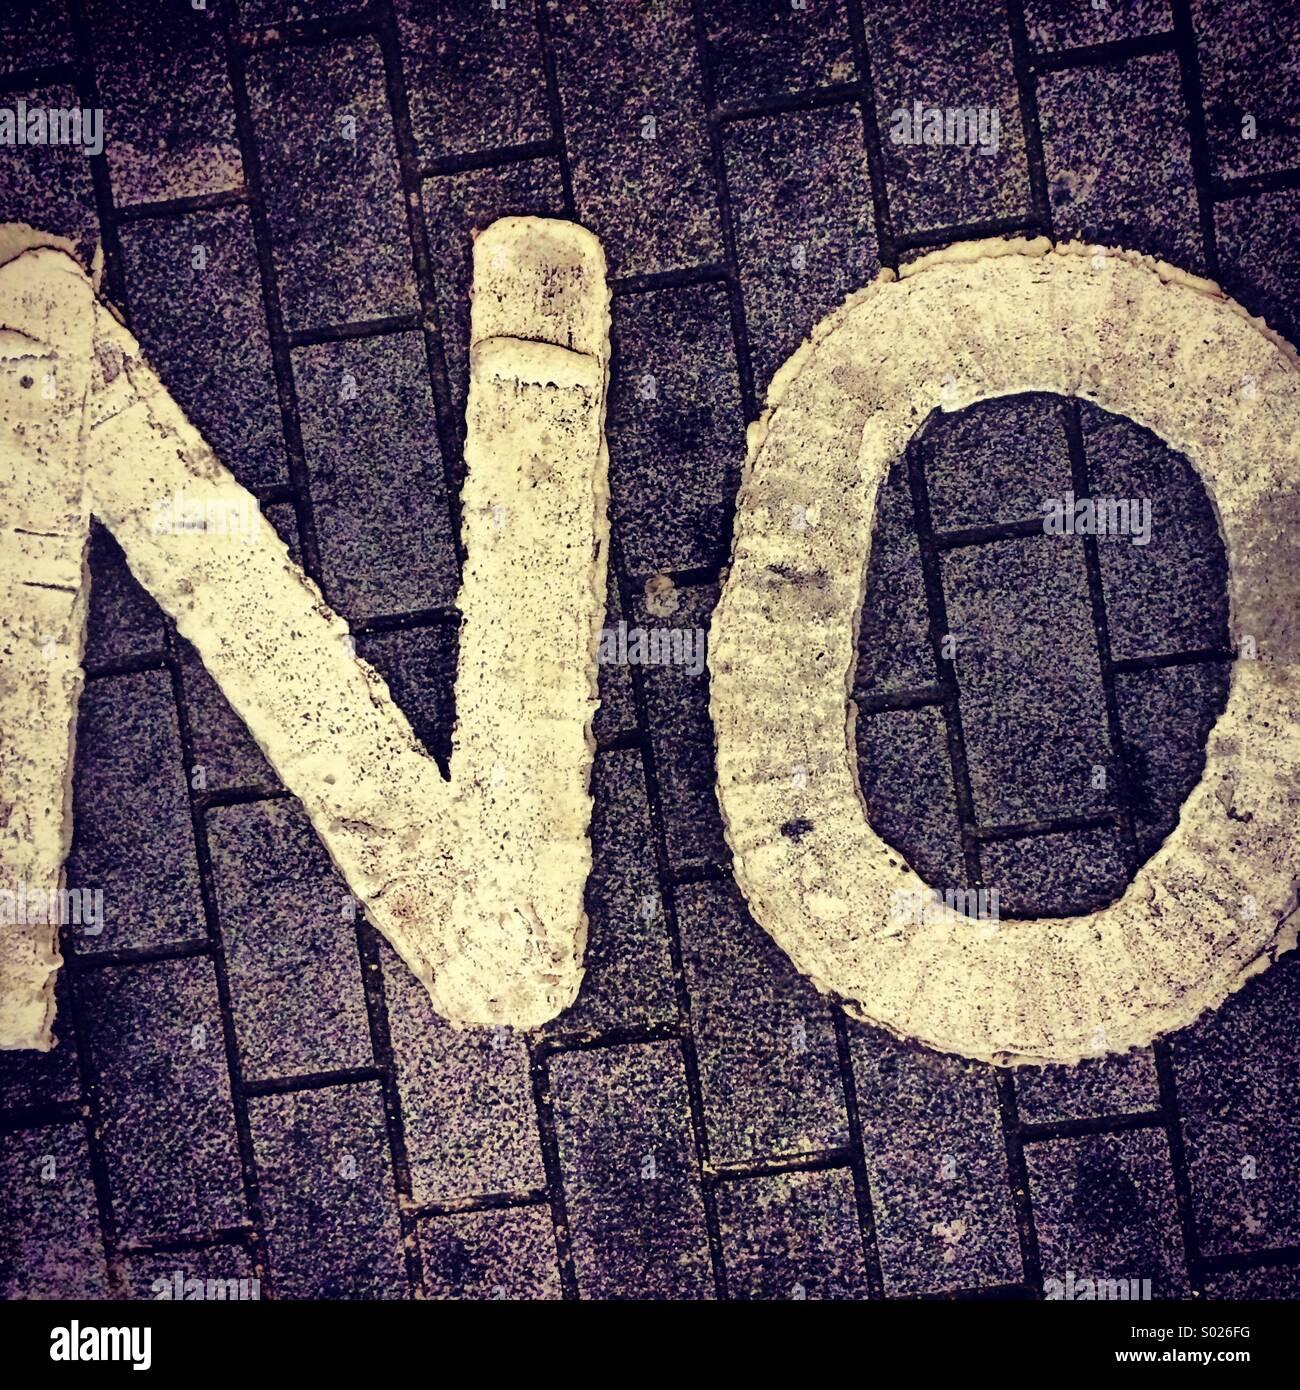 No. Imagen De Stock